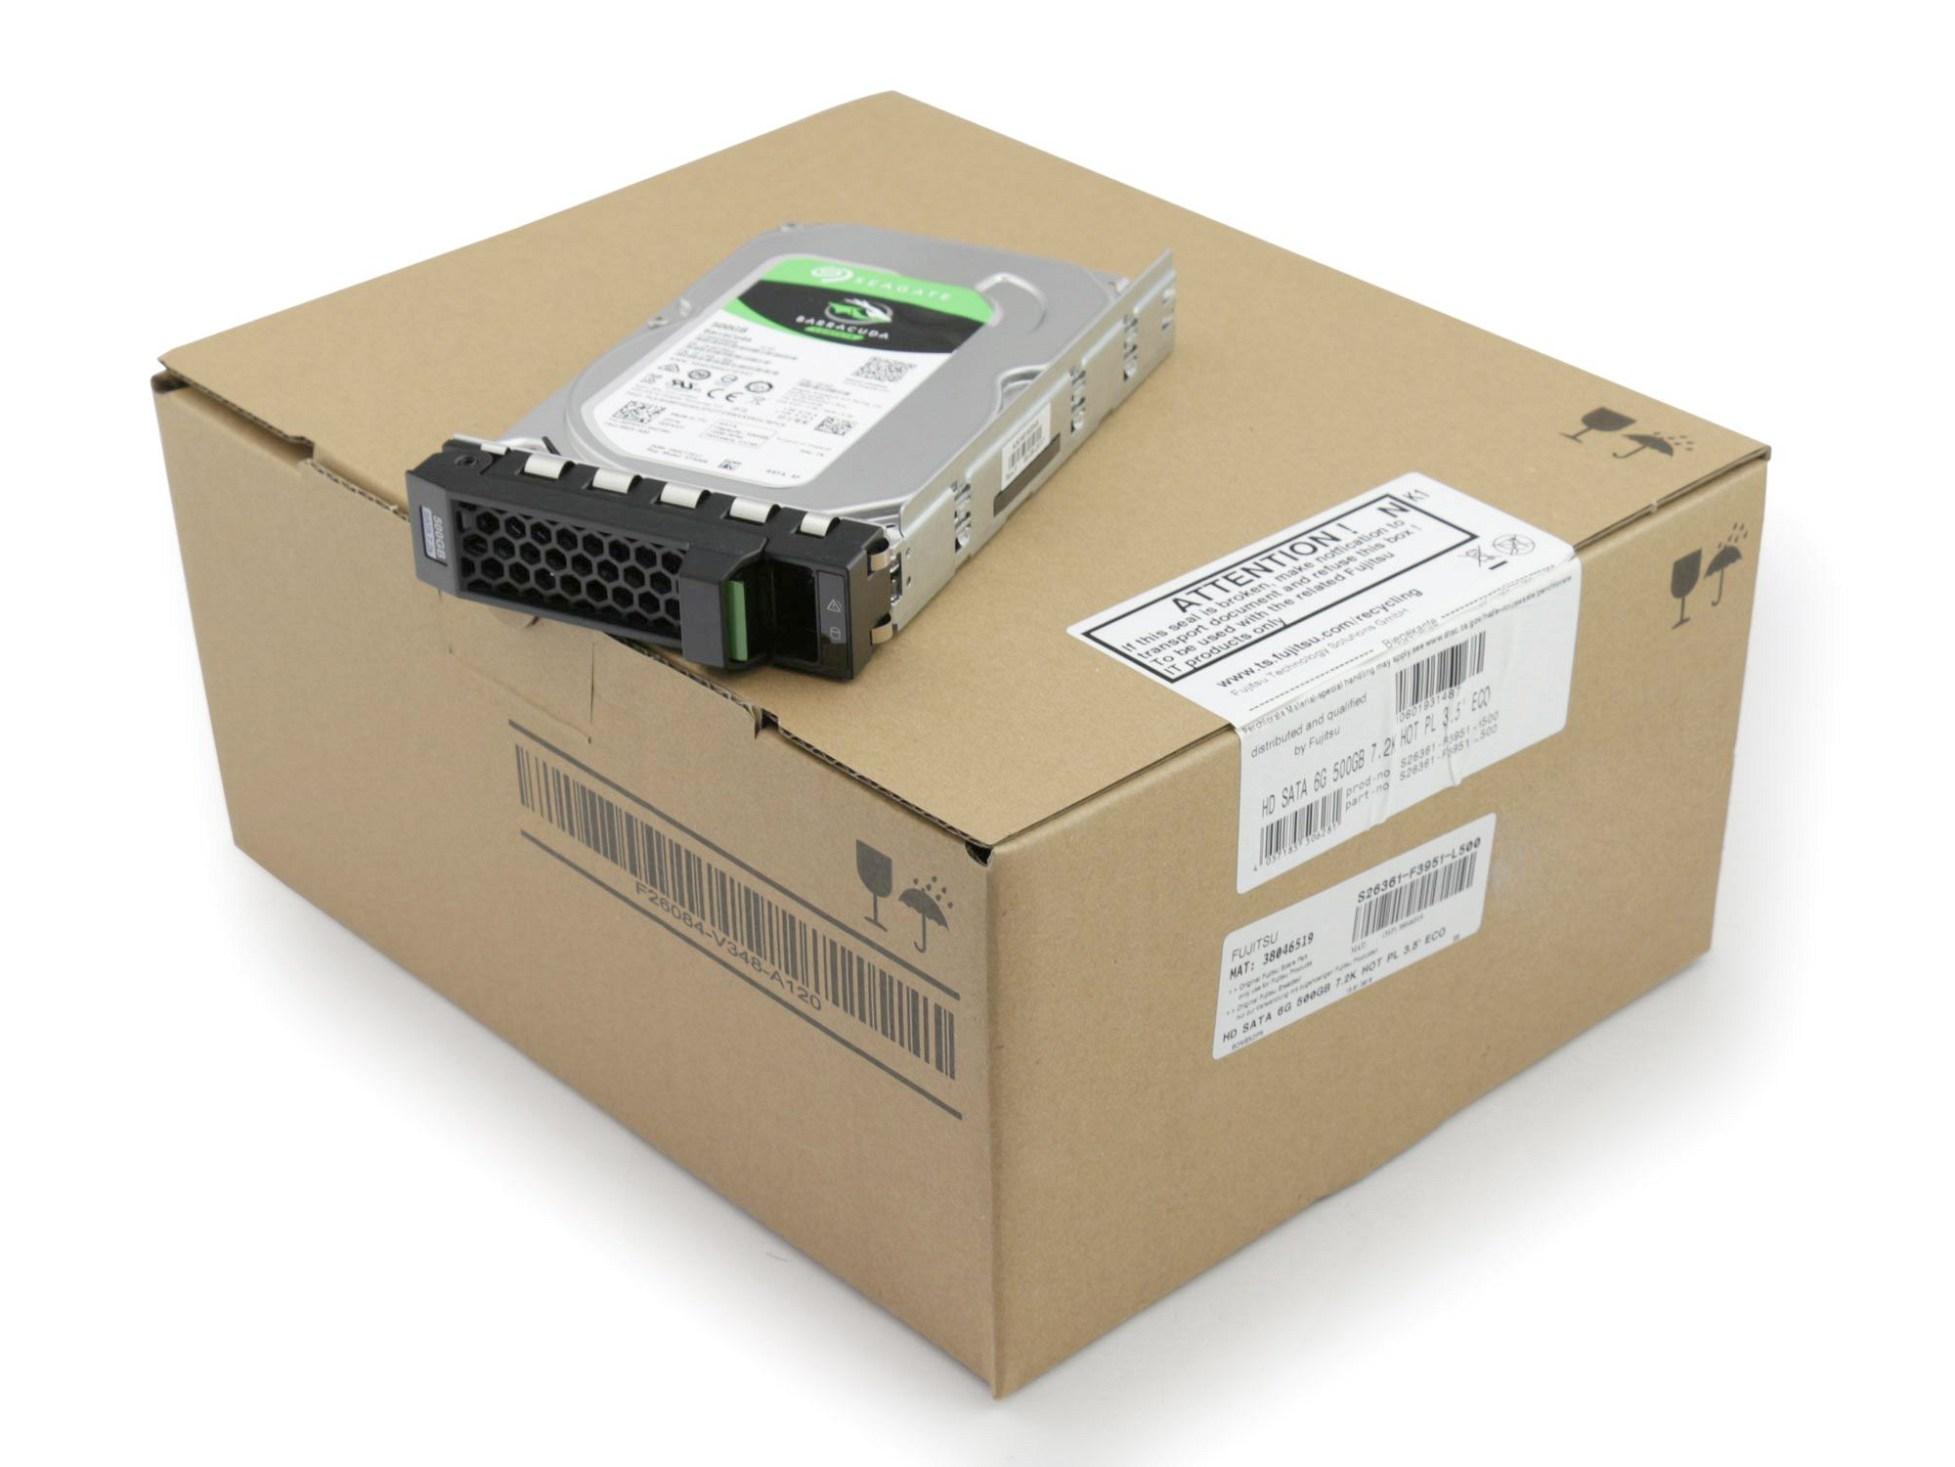 Fujitsu S26361-F3951-L500 Server Festplatte HDD 500GB (3,5 Zoll / 8,9 cm) S-ATA III (6,0 Gb/s) ECO 7.2K inkl. Hot-Plug